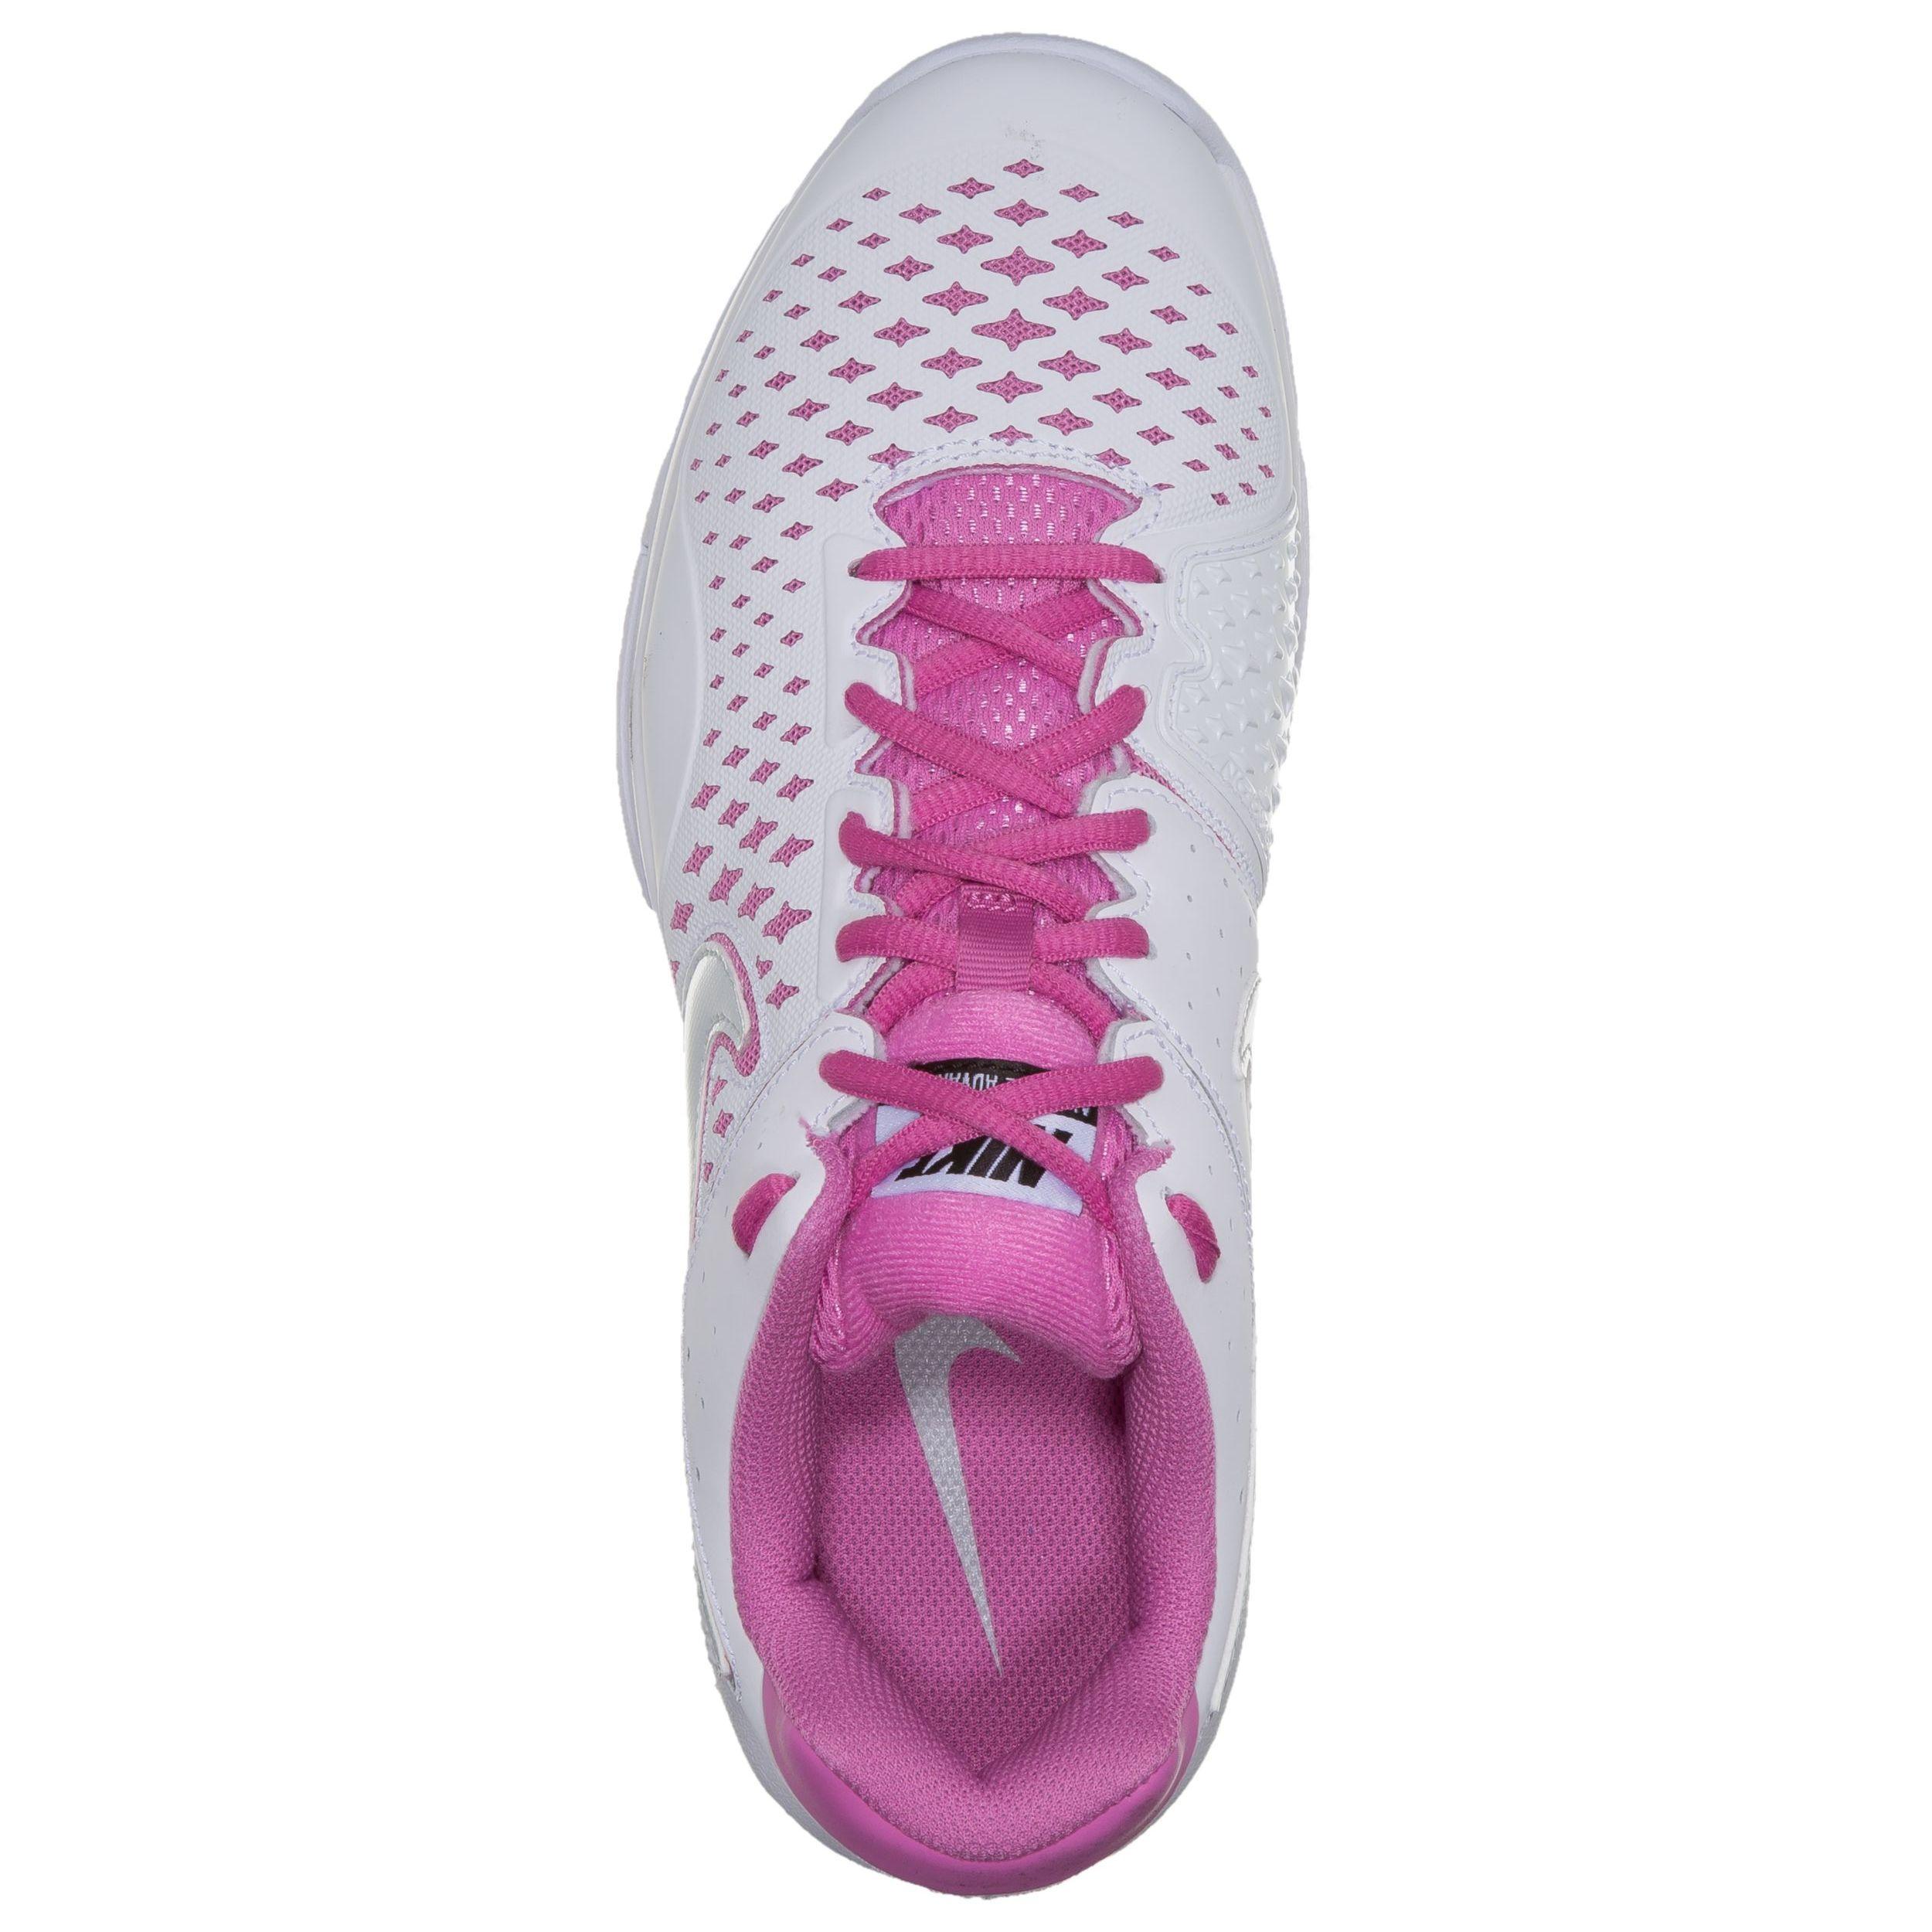 Nike Air Cage Advantage Chaussures Toutes Surfaces Femmes